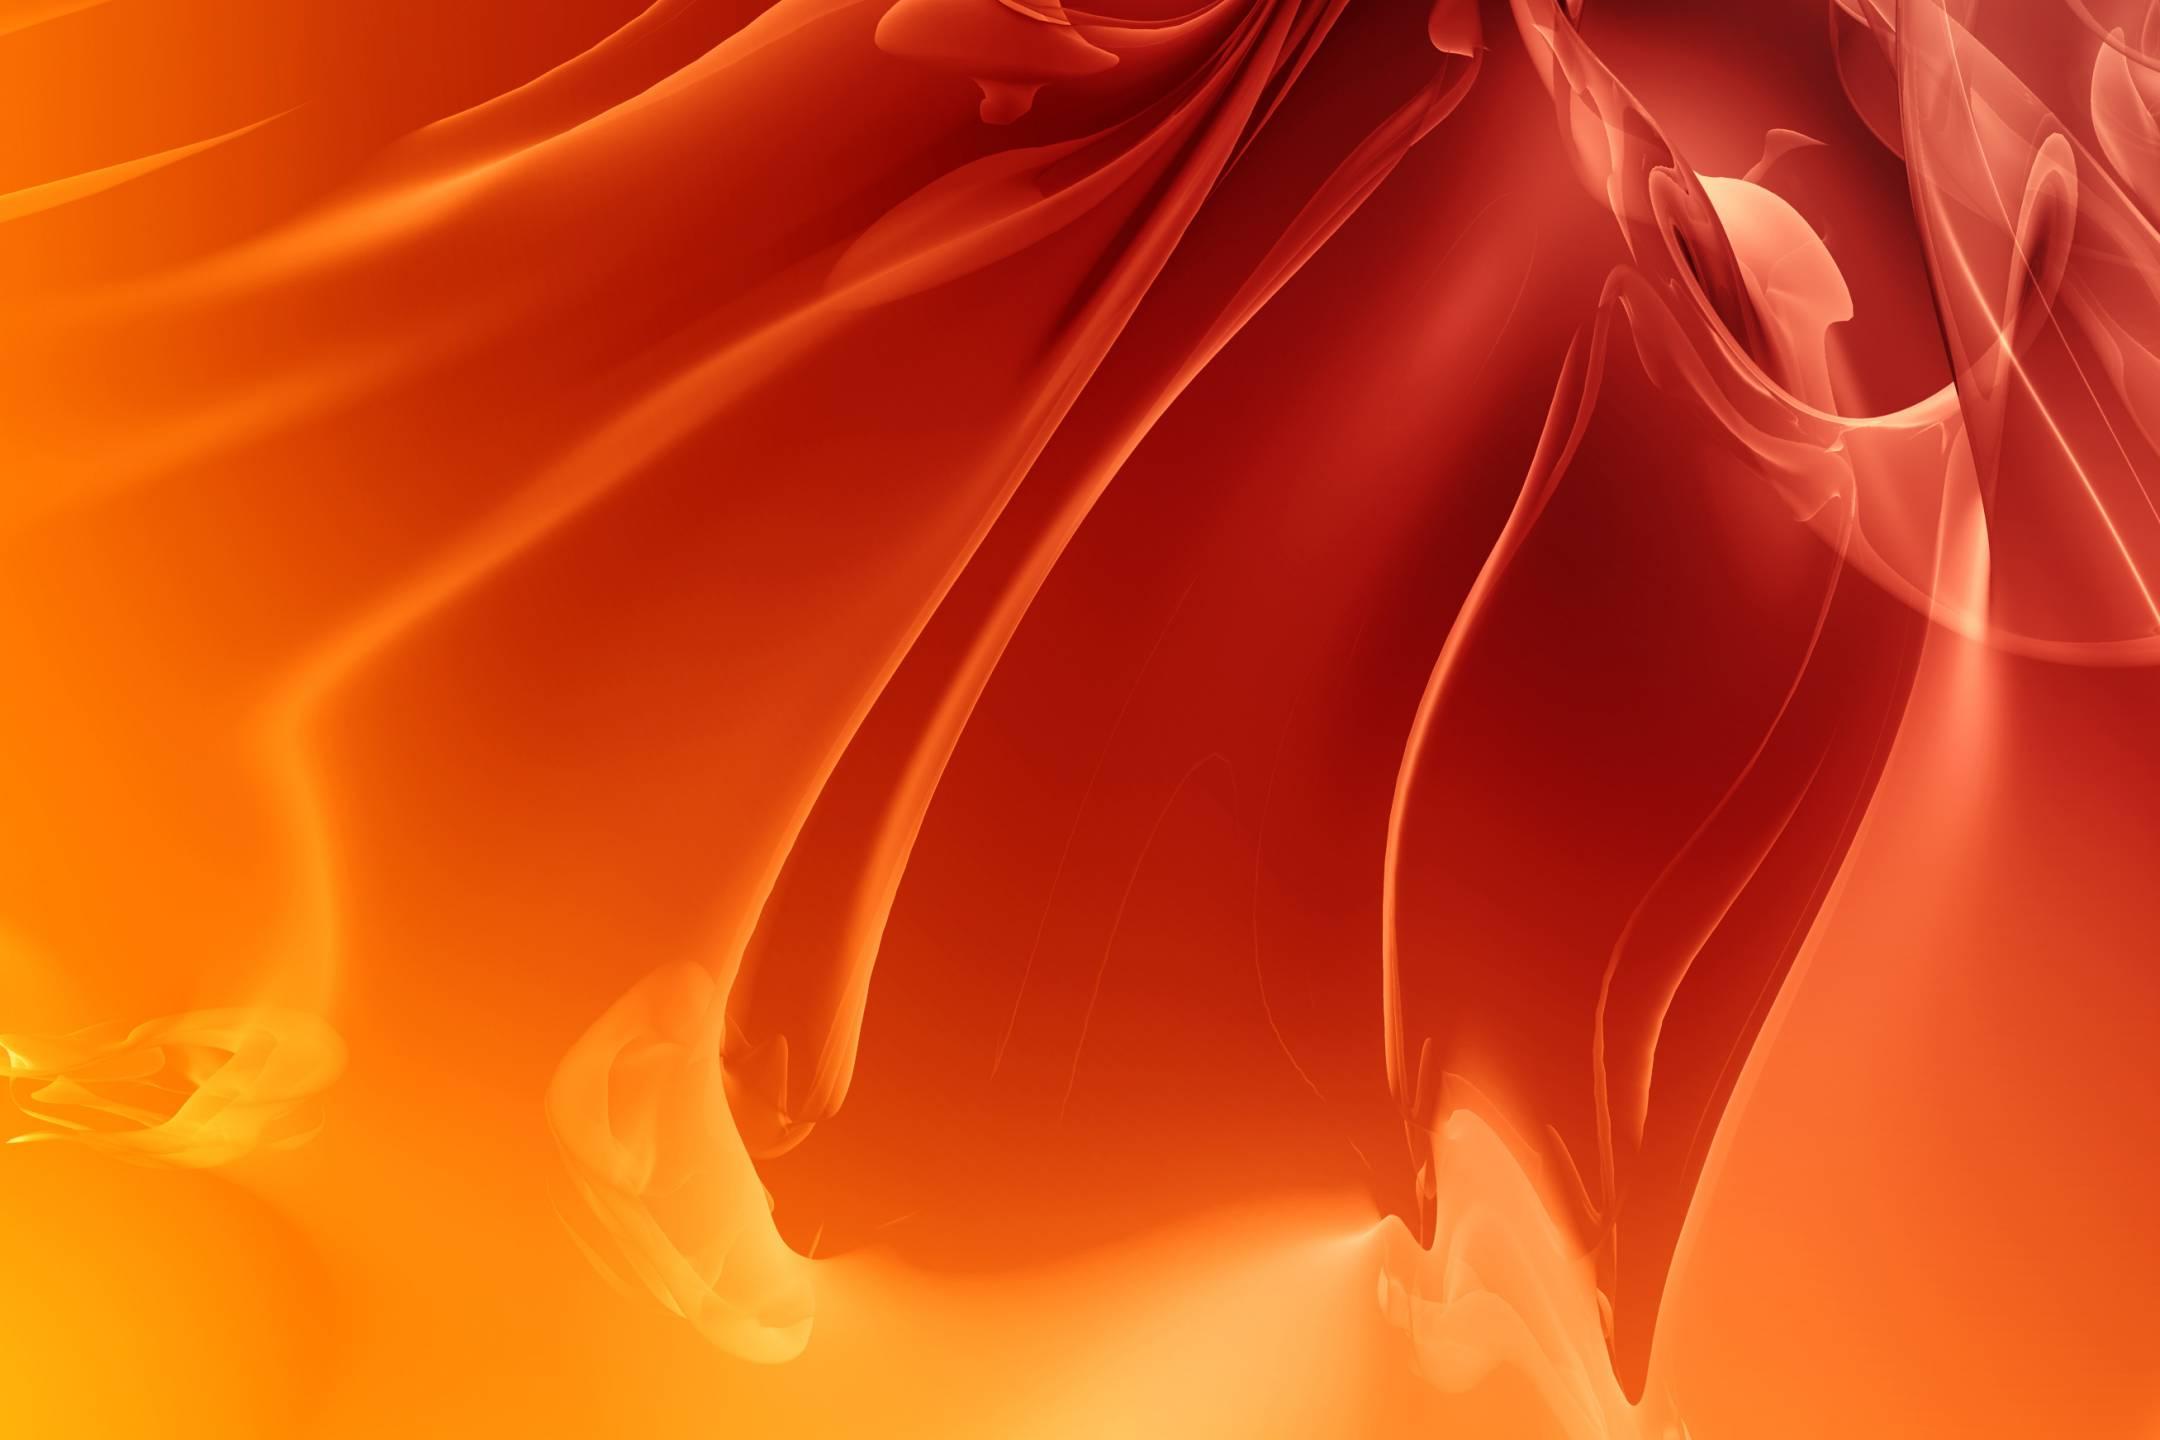 Surface Pro 3 HD Wallpaper - WallpaperSafari